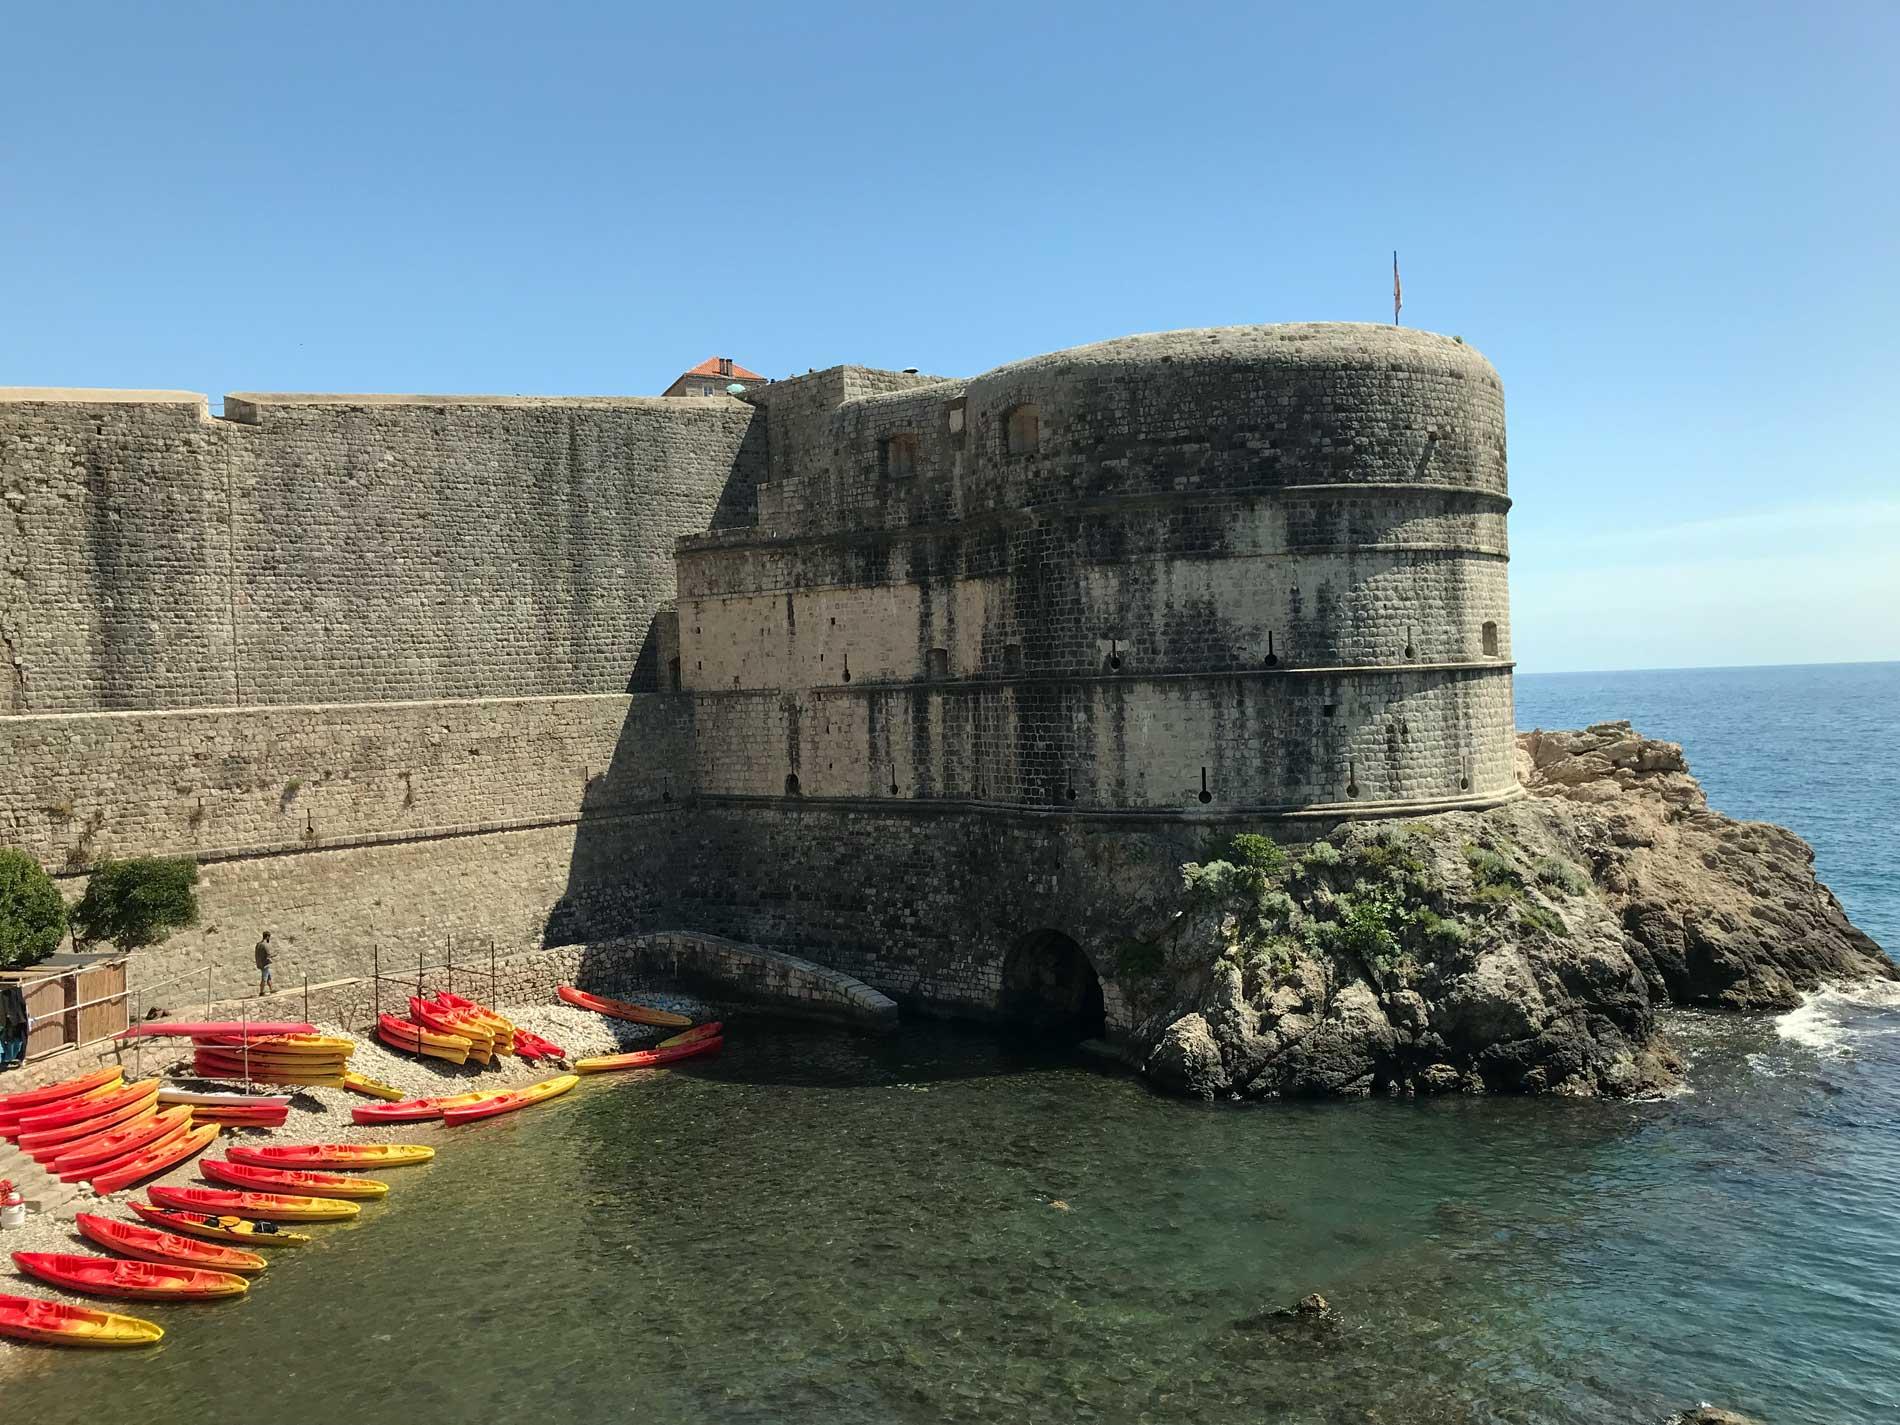 Forte-Bokar-Dubrovnik-Croazia-mare-Adriatico-kayak-rossi